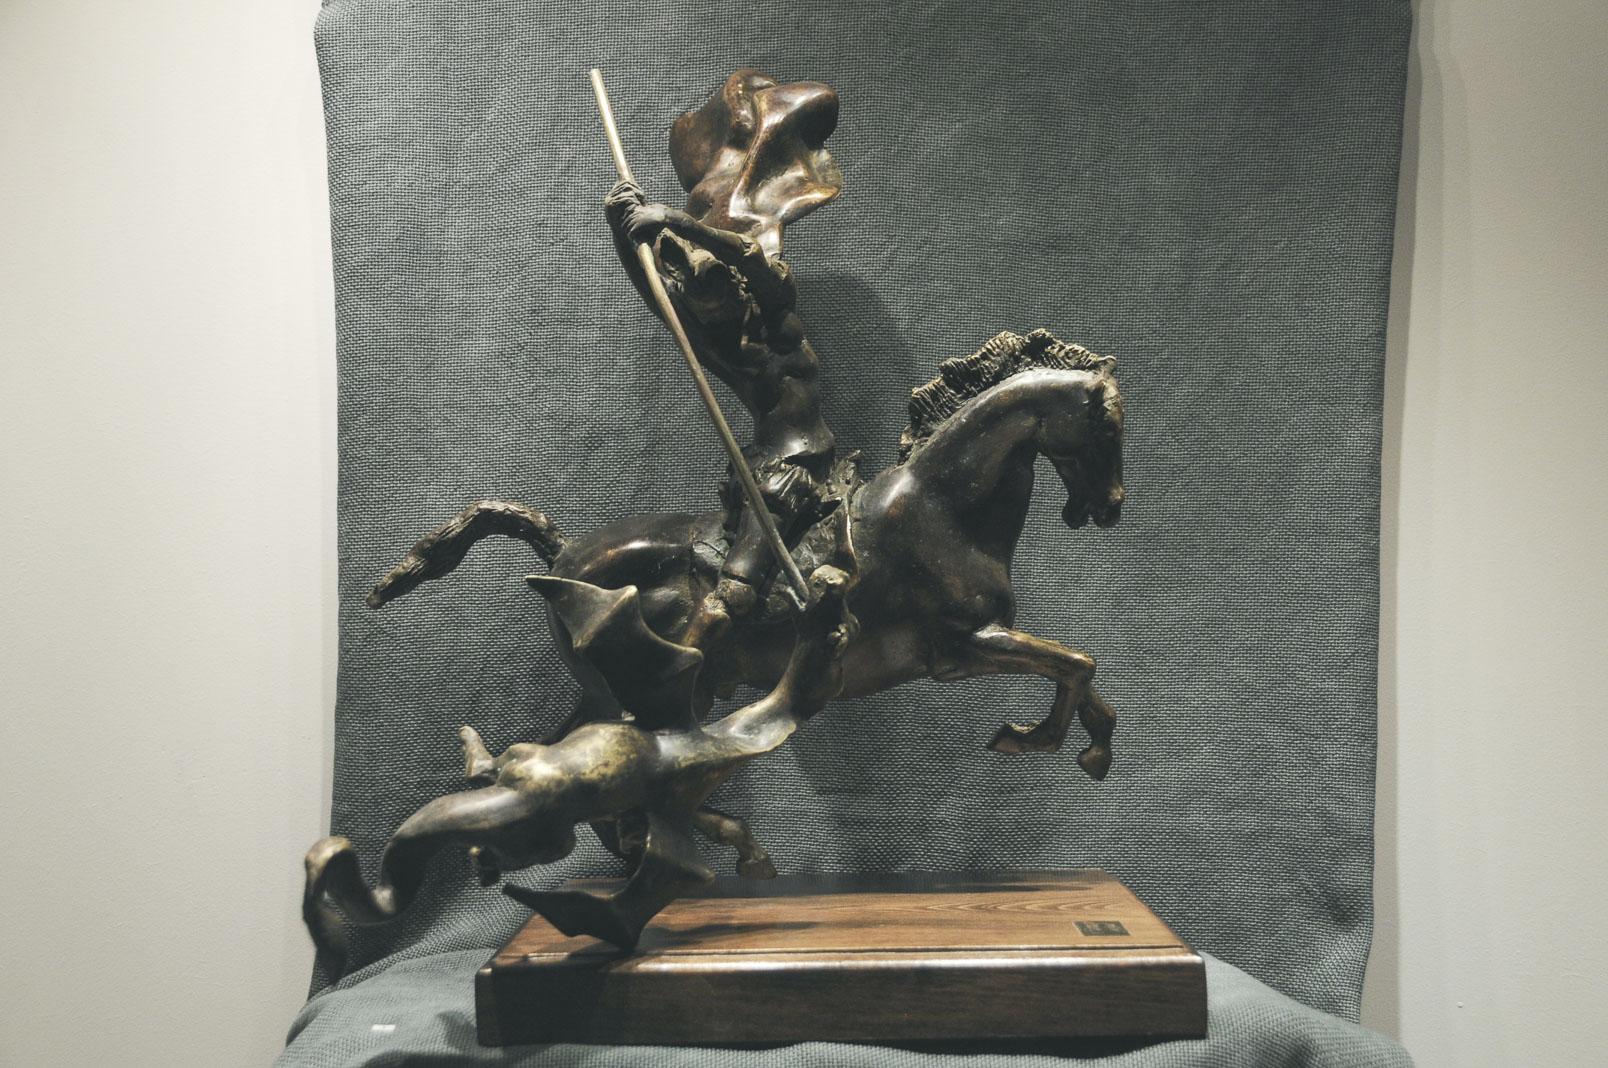 troyan-museum-jivotat-na-edna-idea-10